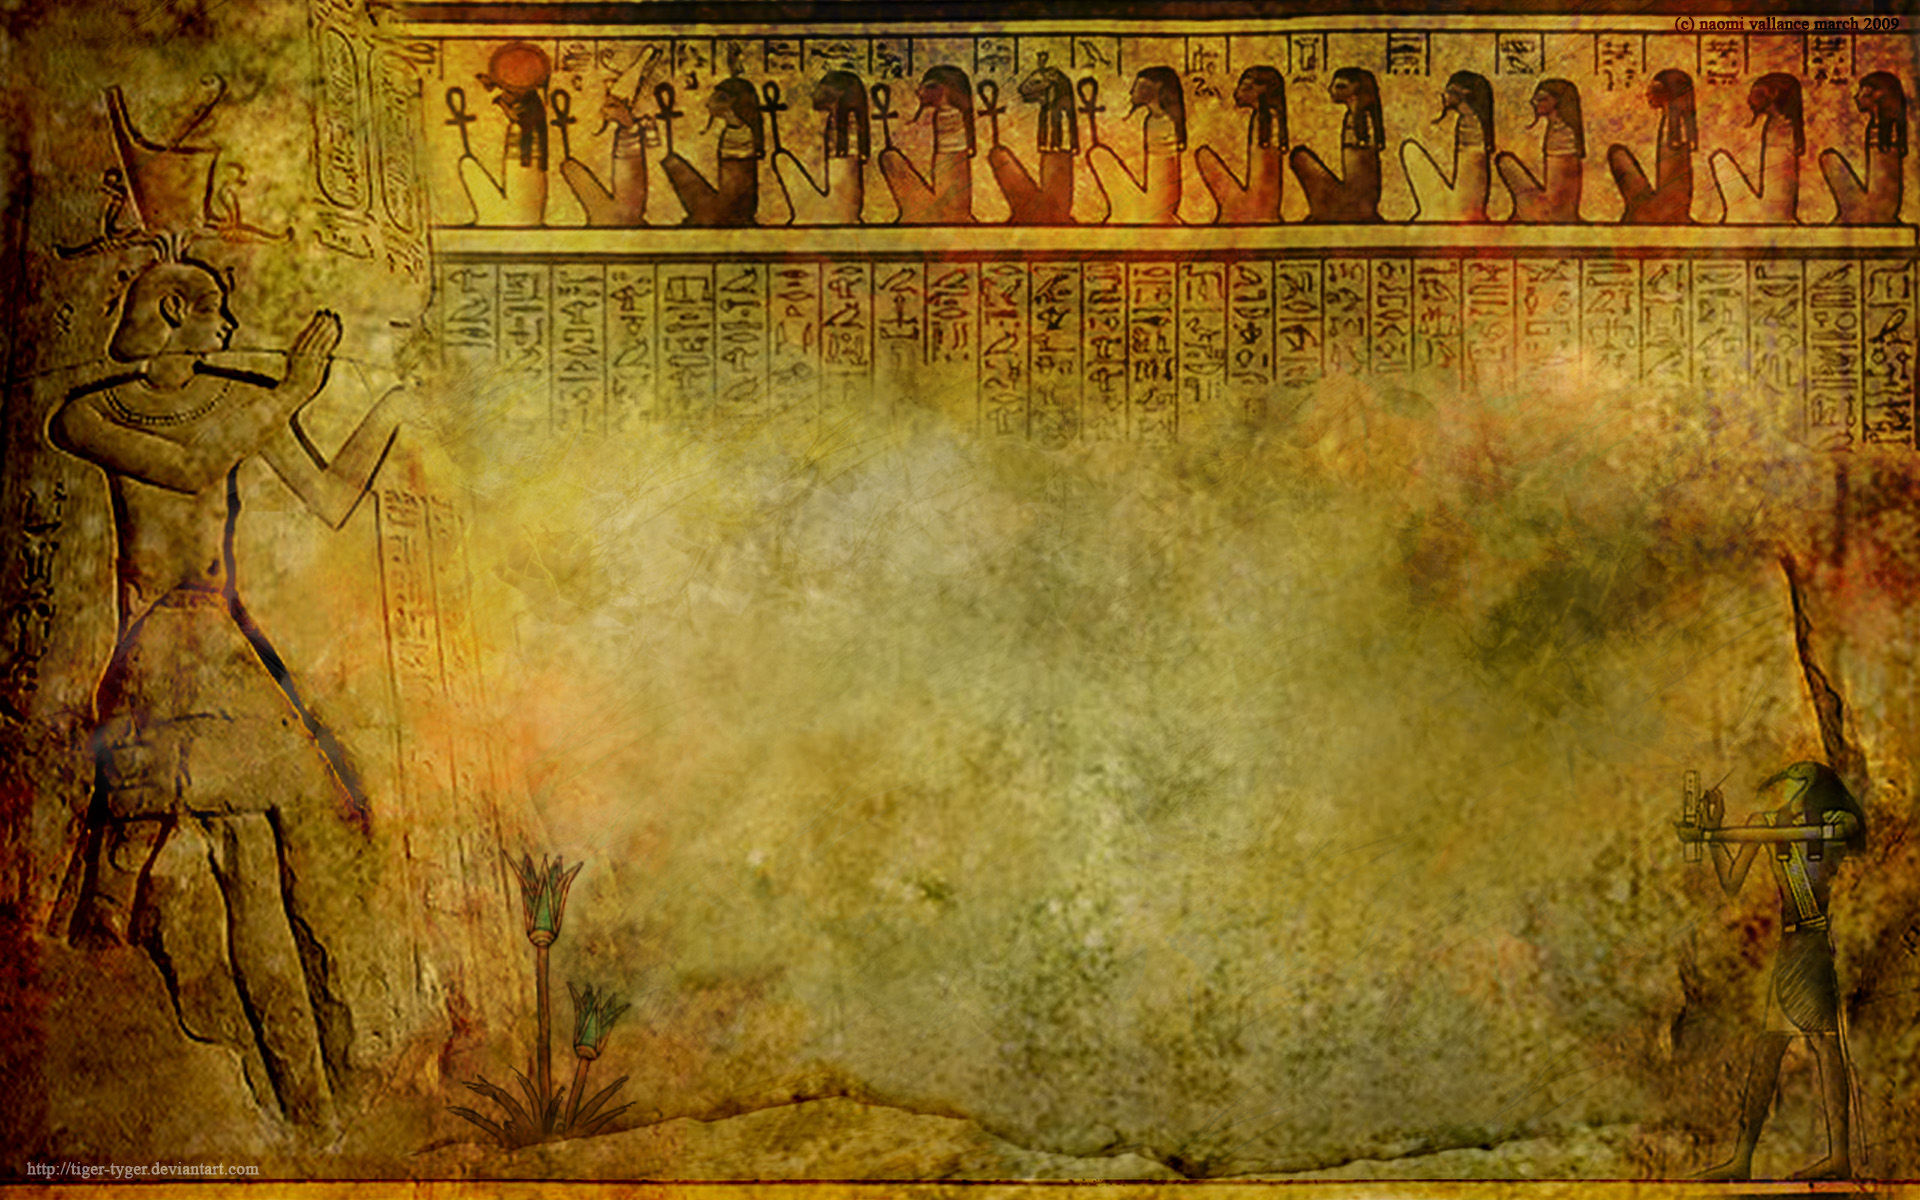 Egypt wallpapers | Egypt background